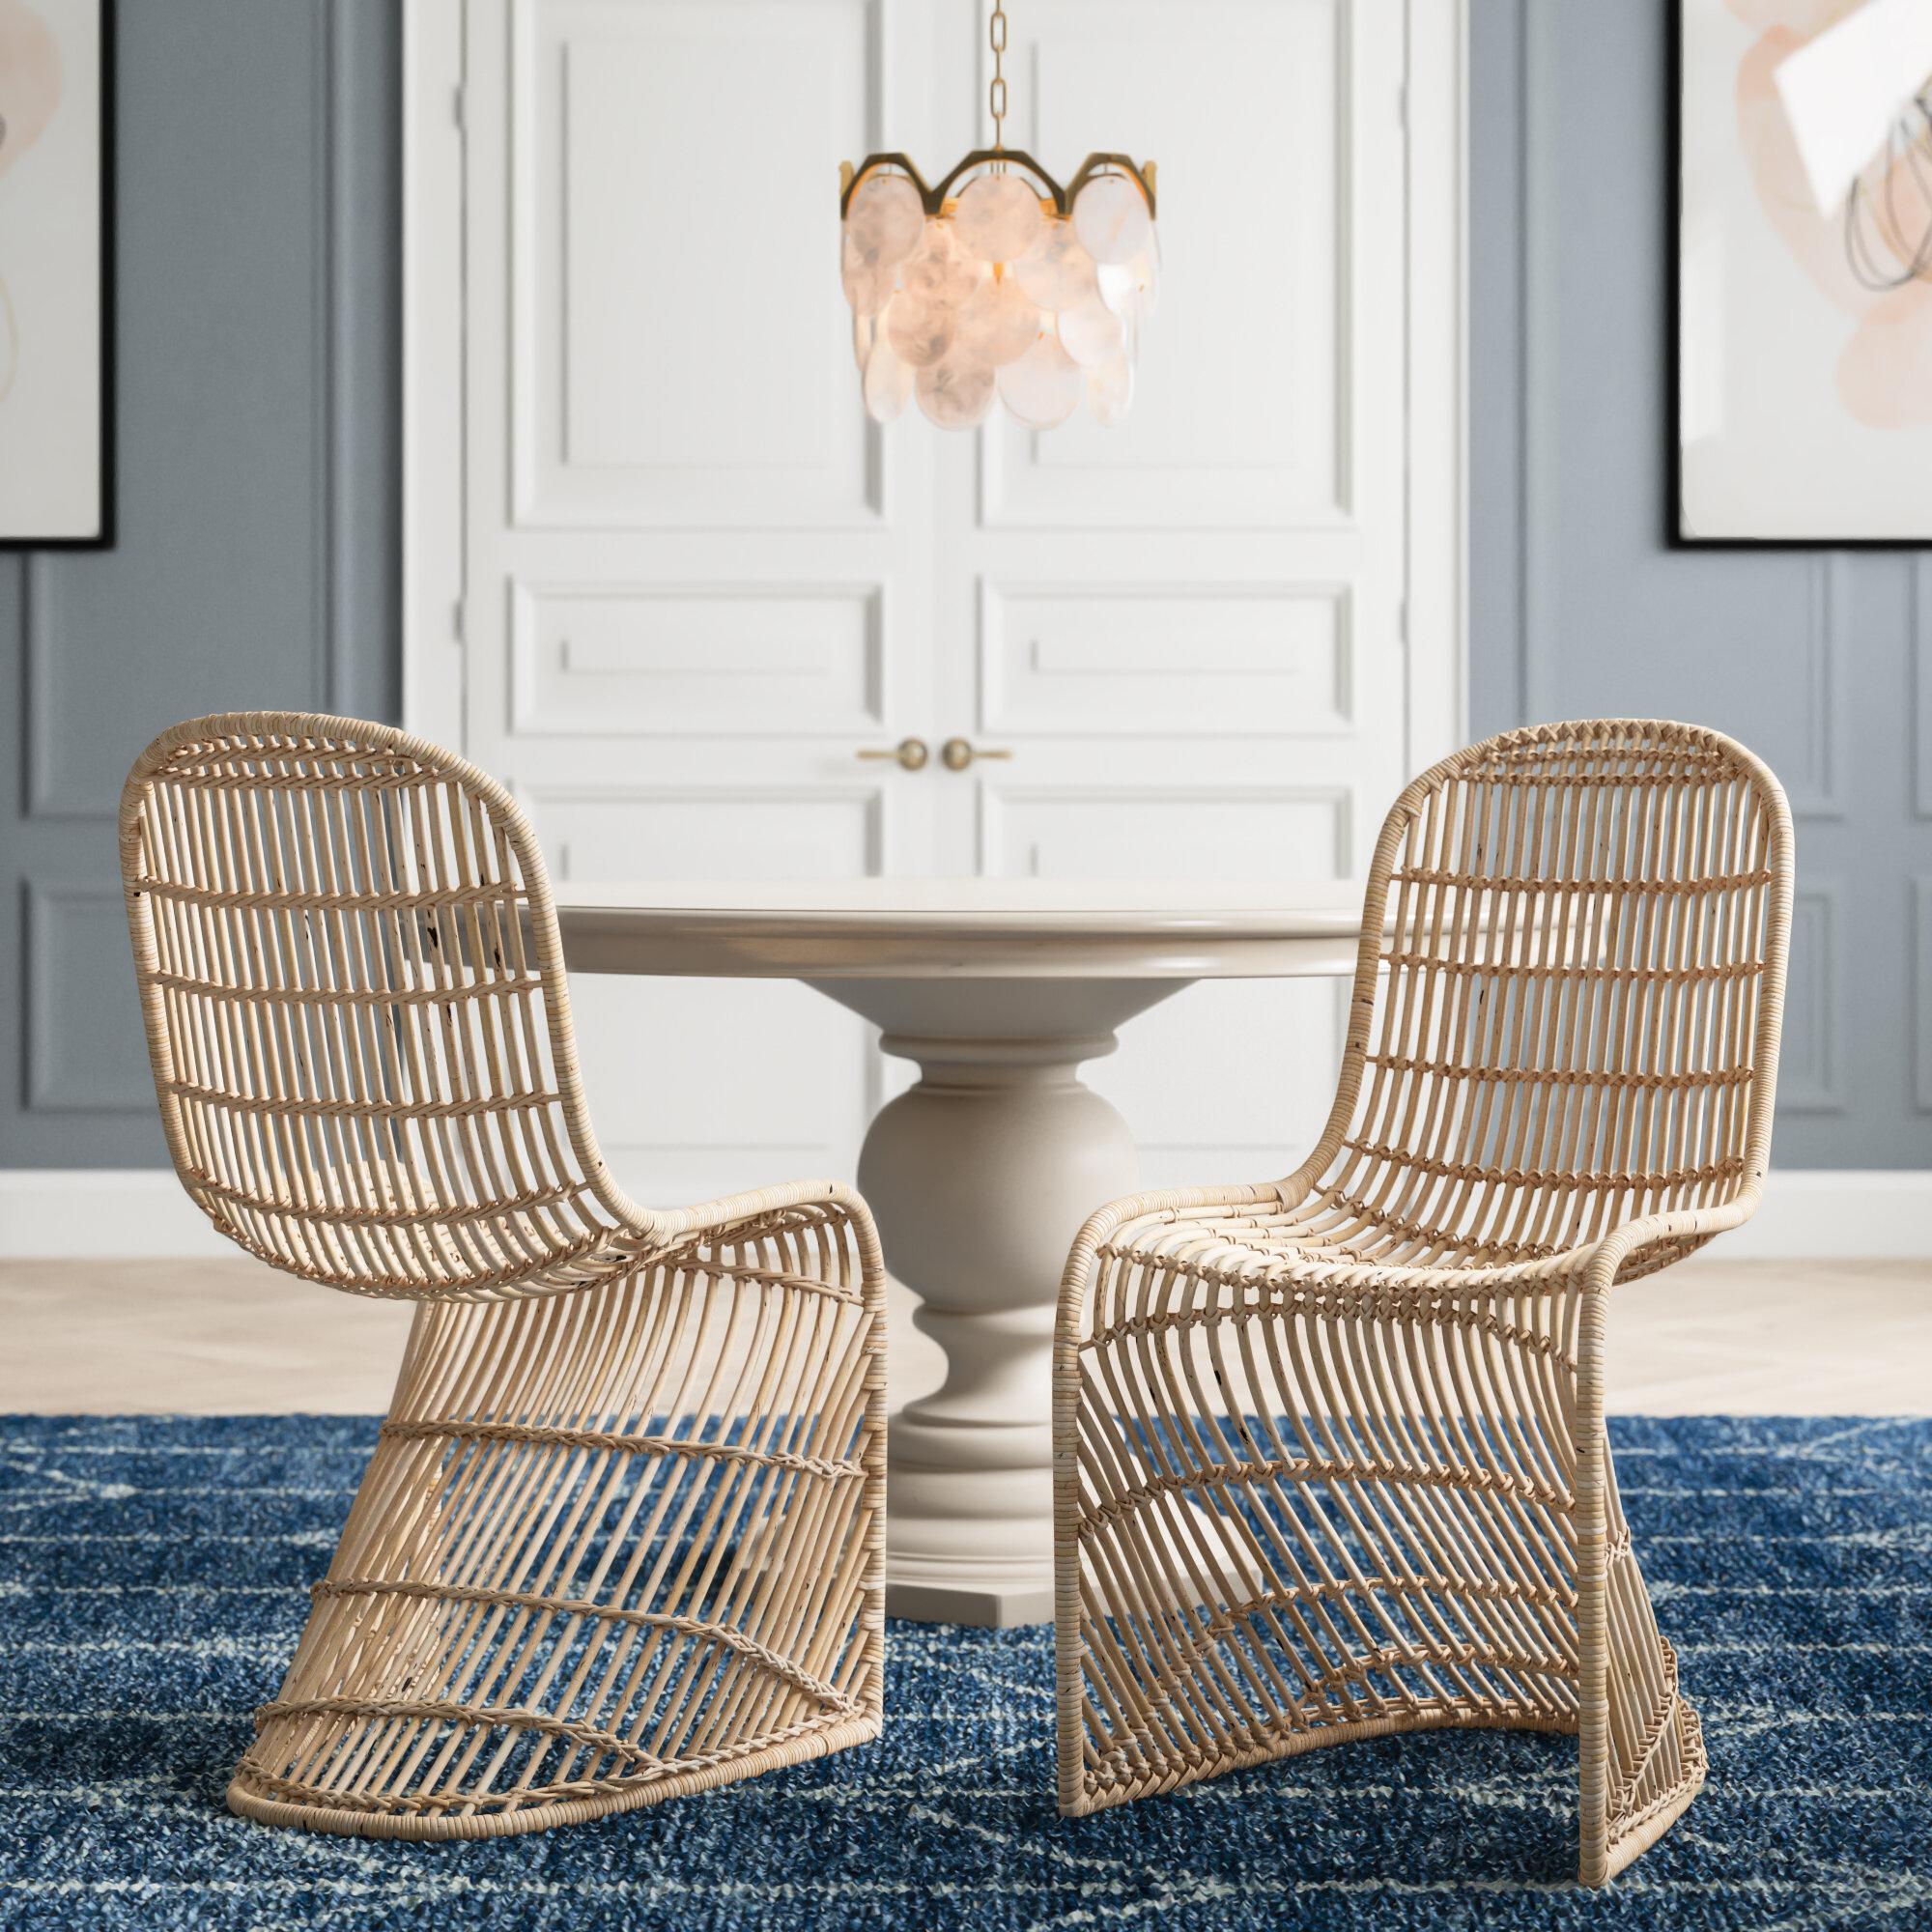 Wicker Rattan Dining Chairs Joss Main